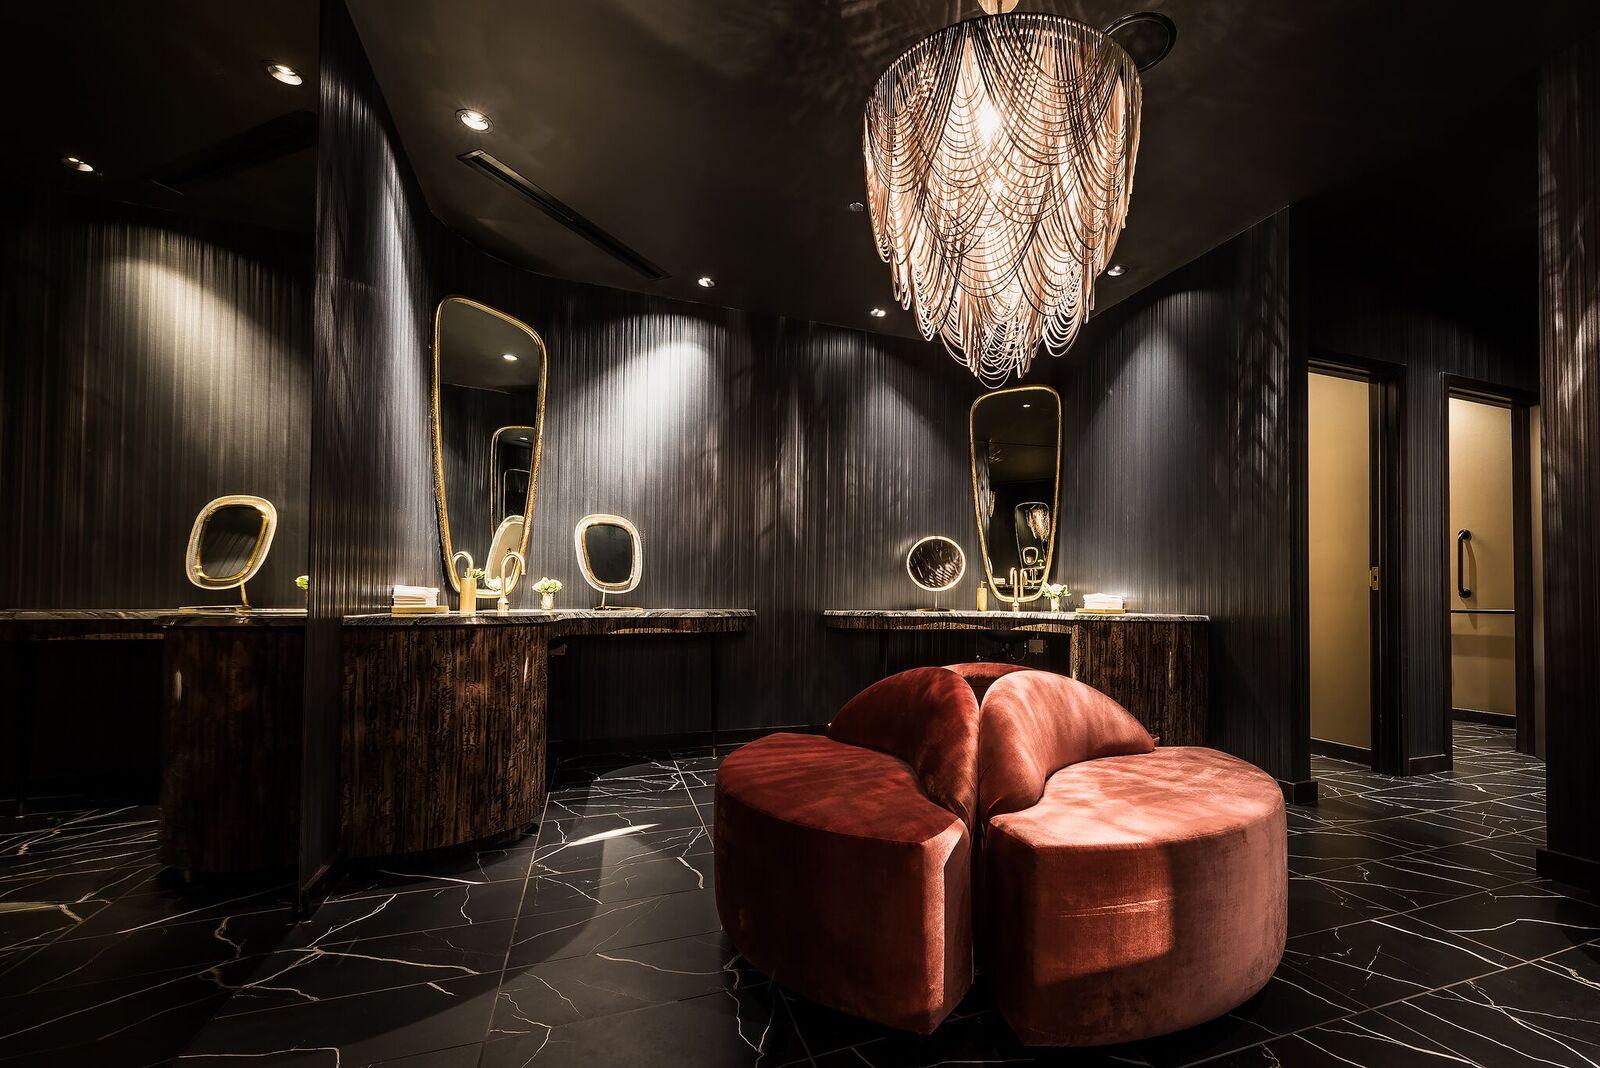 BLVD Chicago, studio k creative, natural stone bathrooms, luxury bathrooms, bathroom design, dream bathrooms, most beautiful restaurant restrooms, black marble floors, marble bathrooms